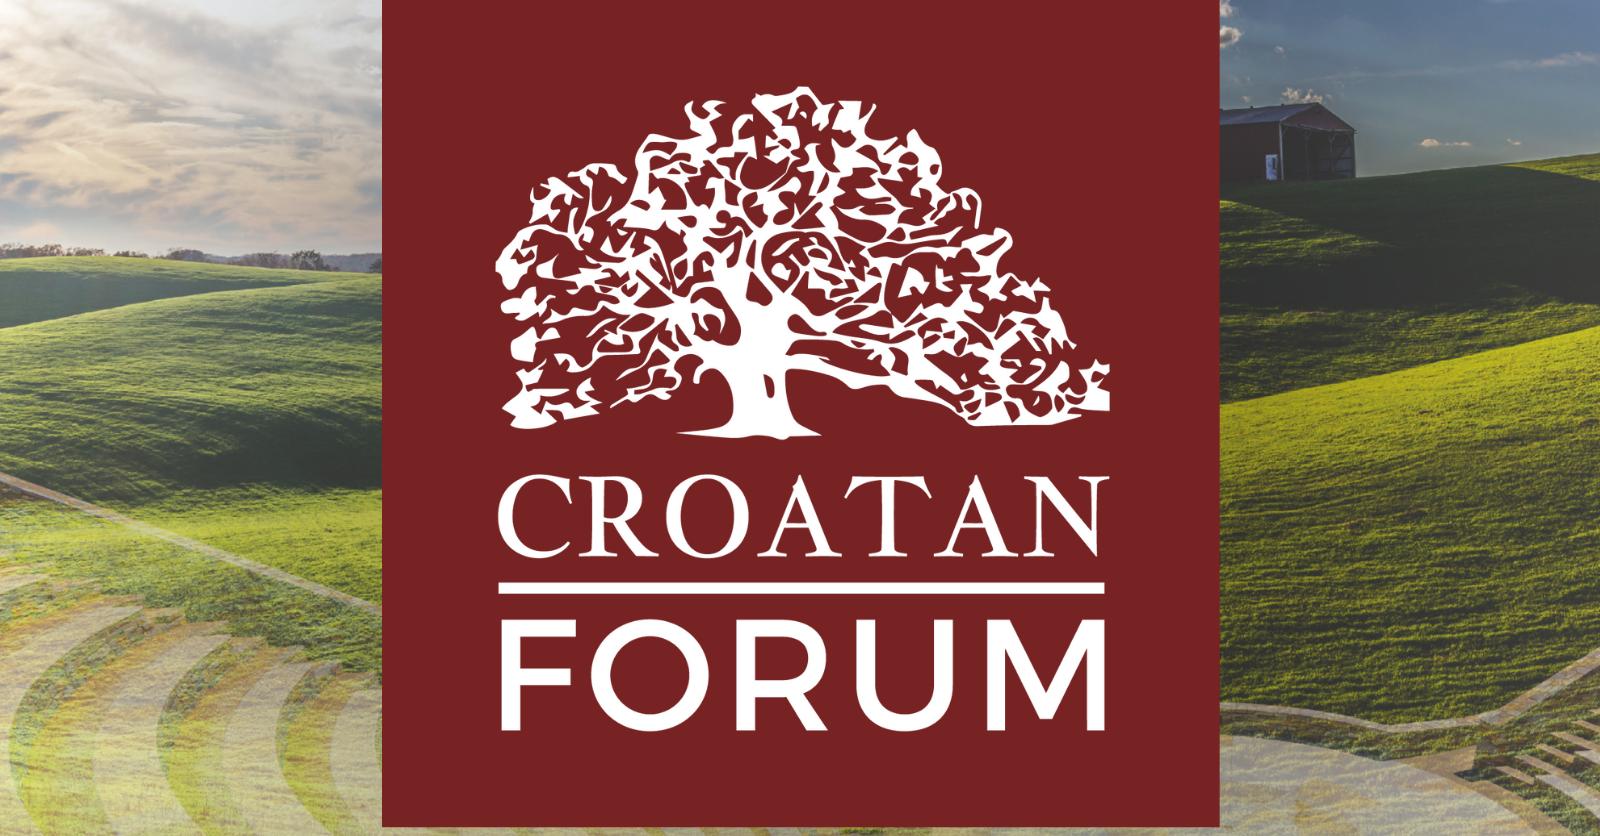 Croatan Forum